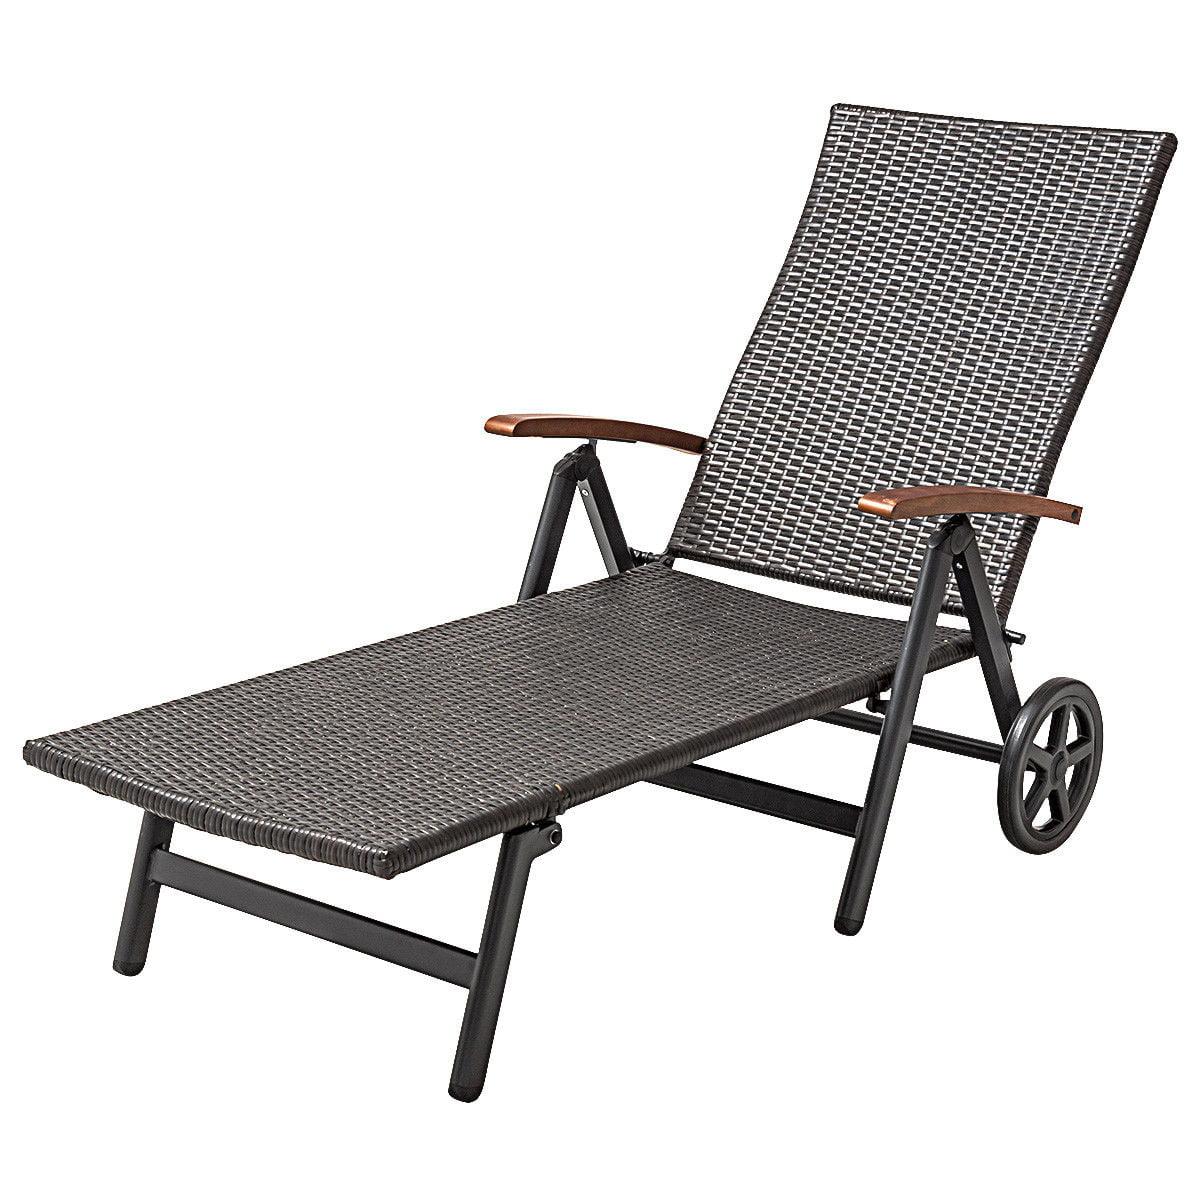 Gymax Folding Recliner Adjustable Lounge Chair Wheels Patio Deck Beach Brown Rattan